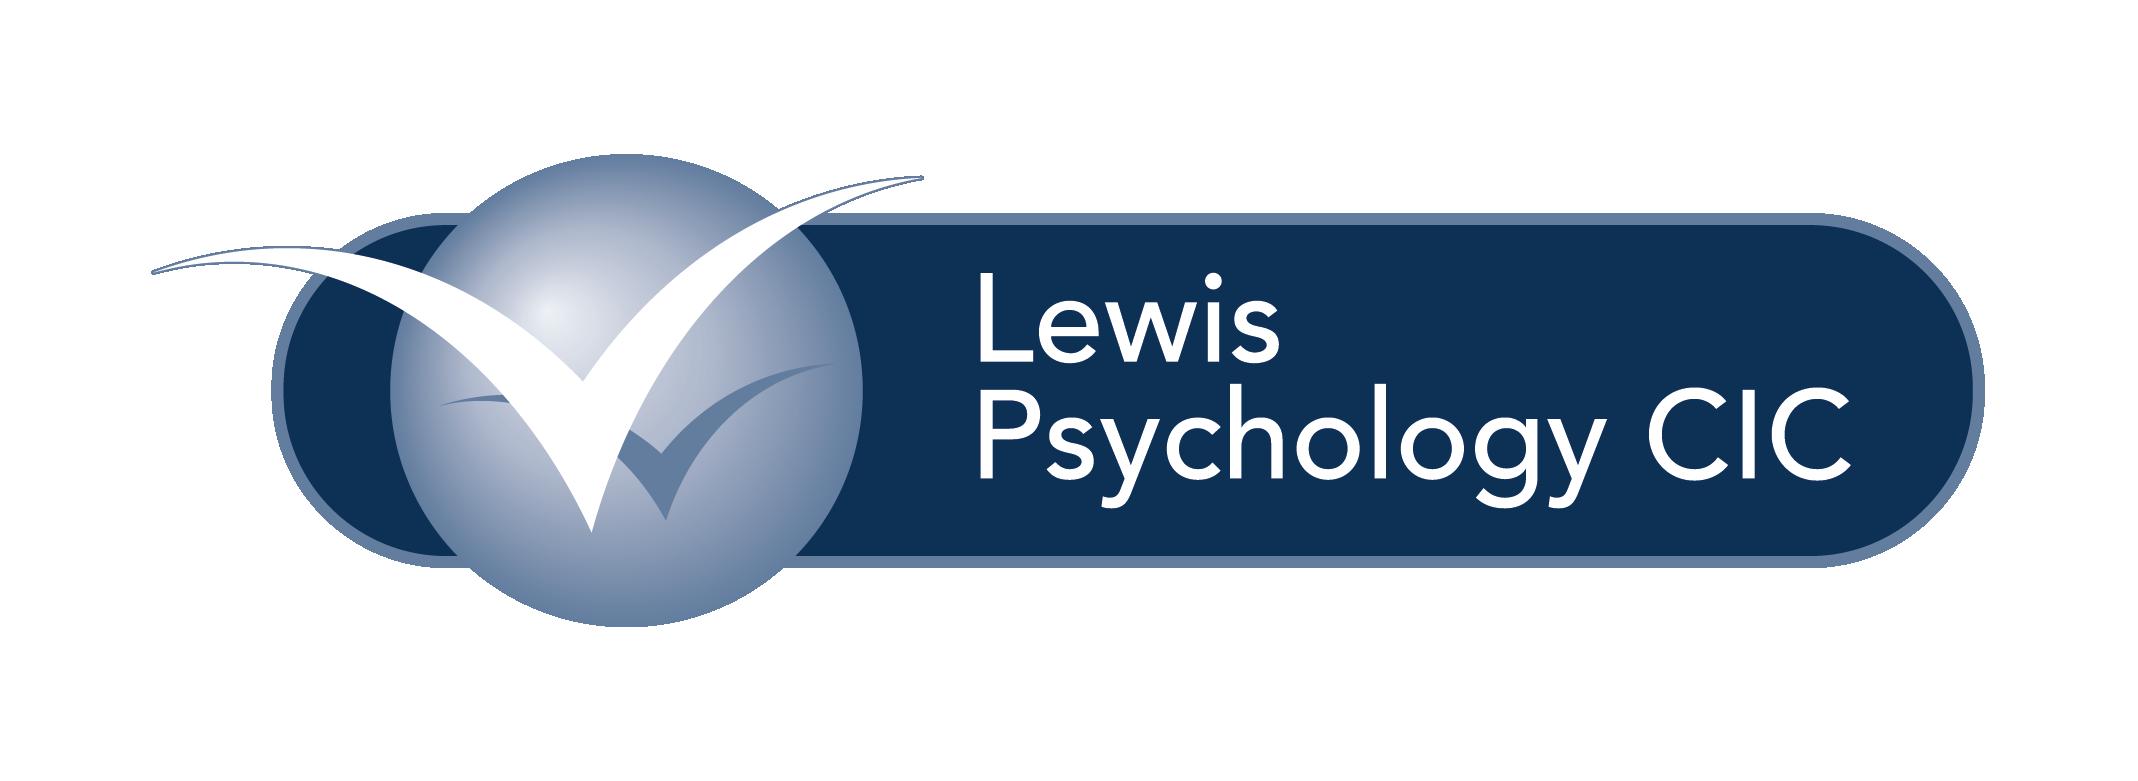 Lewis Psychology CIC